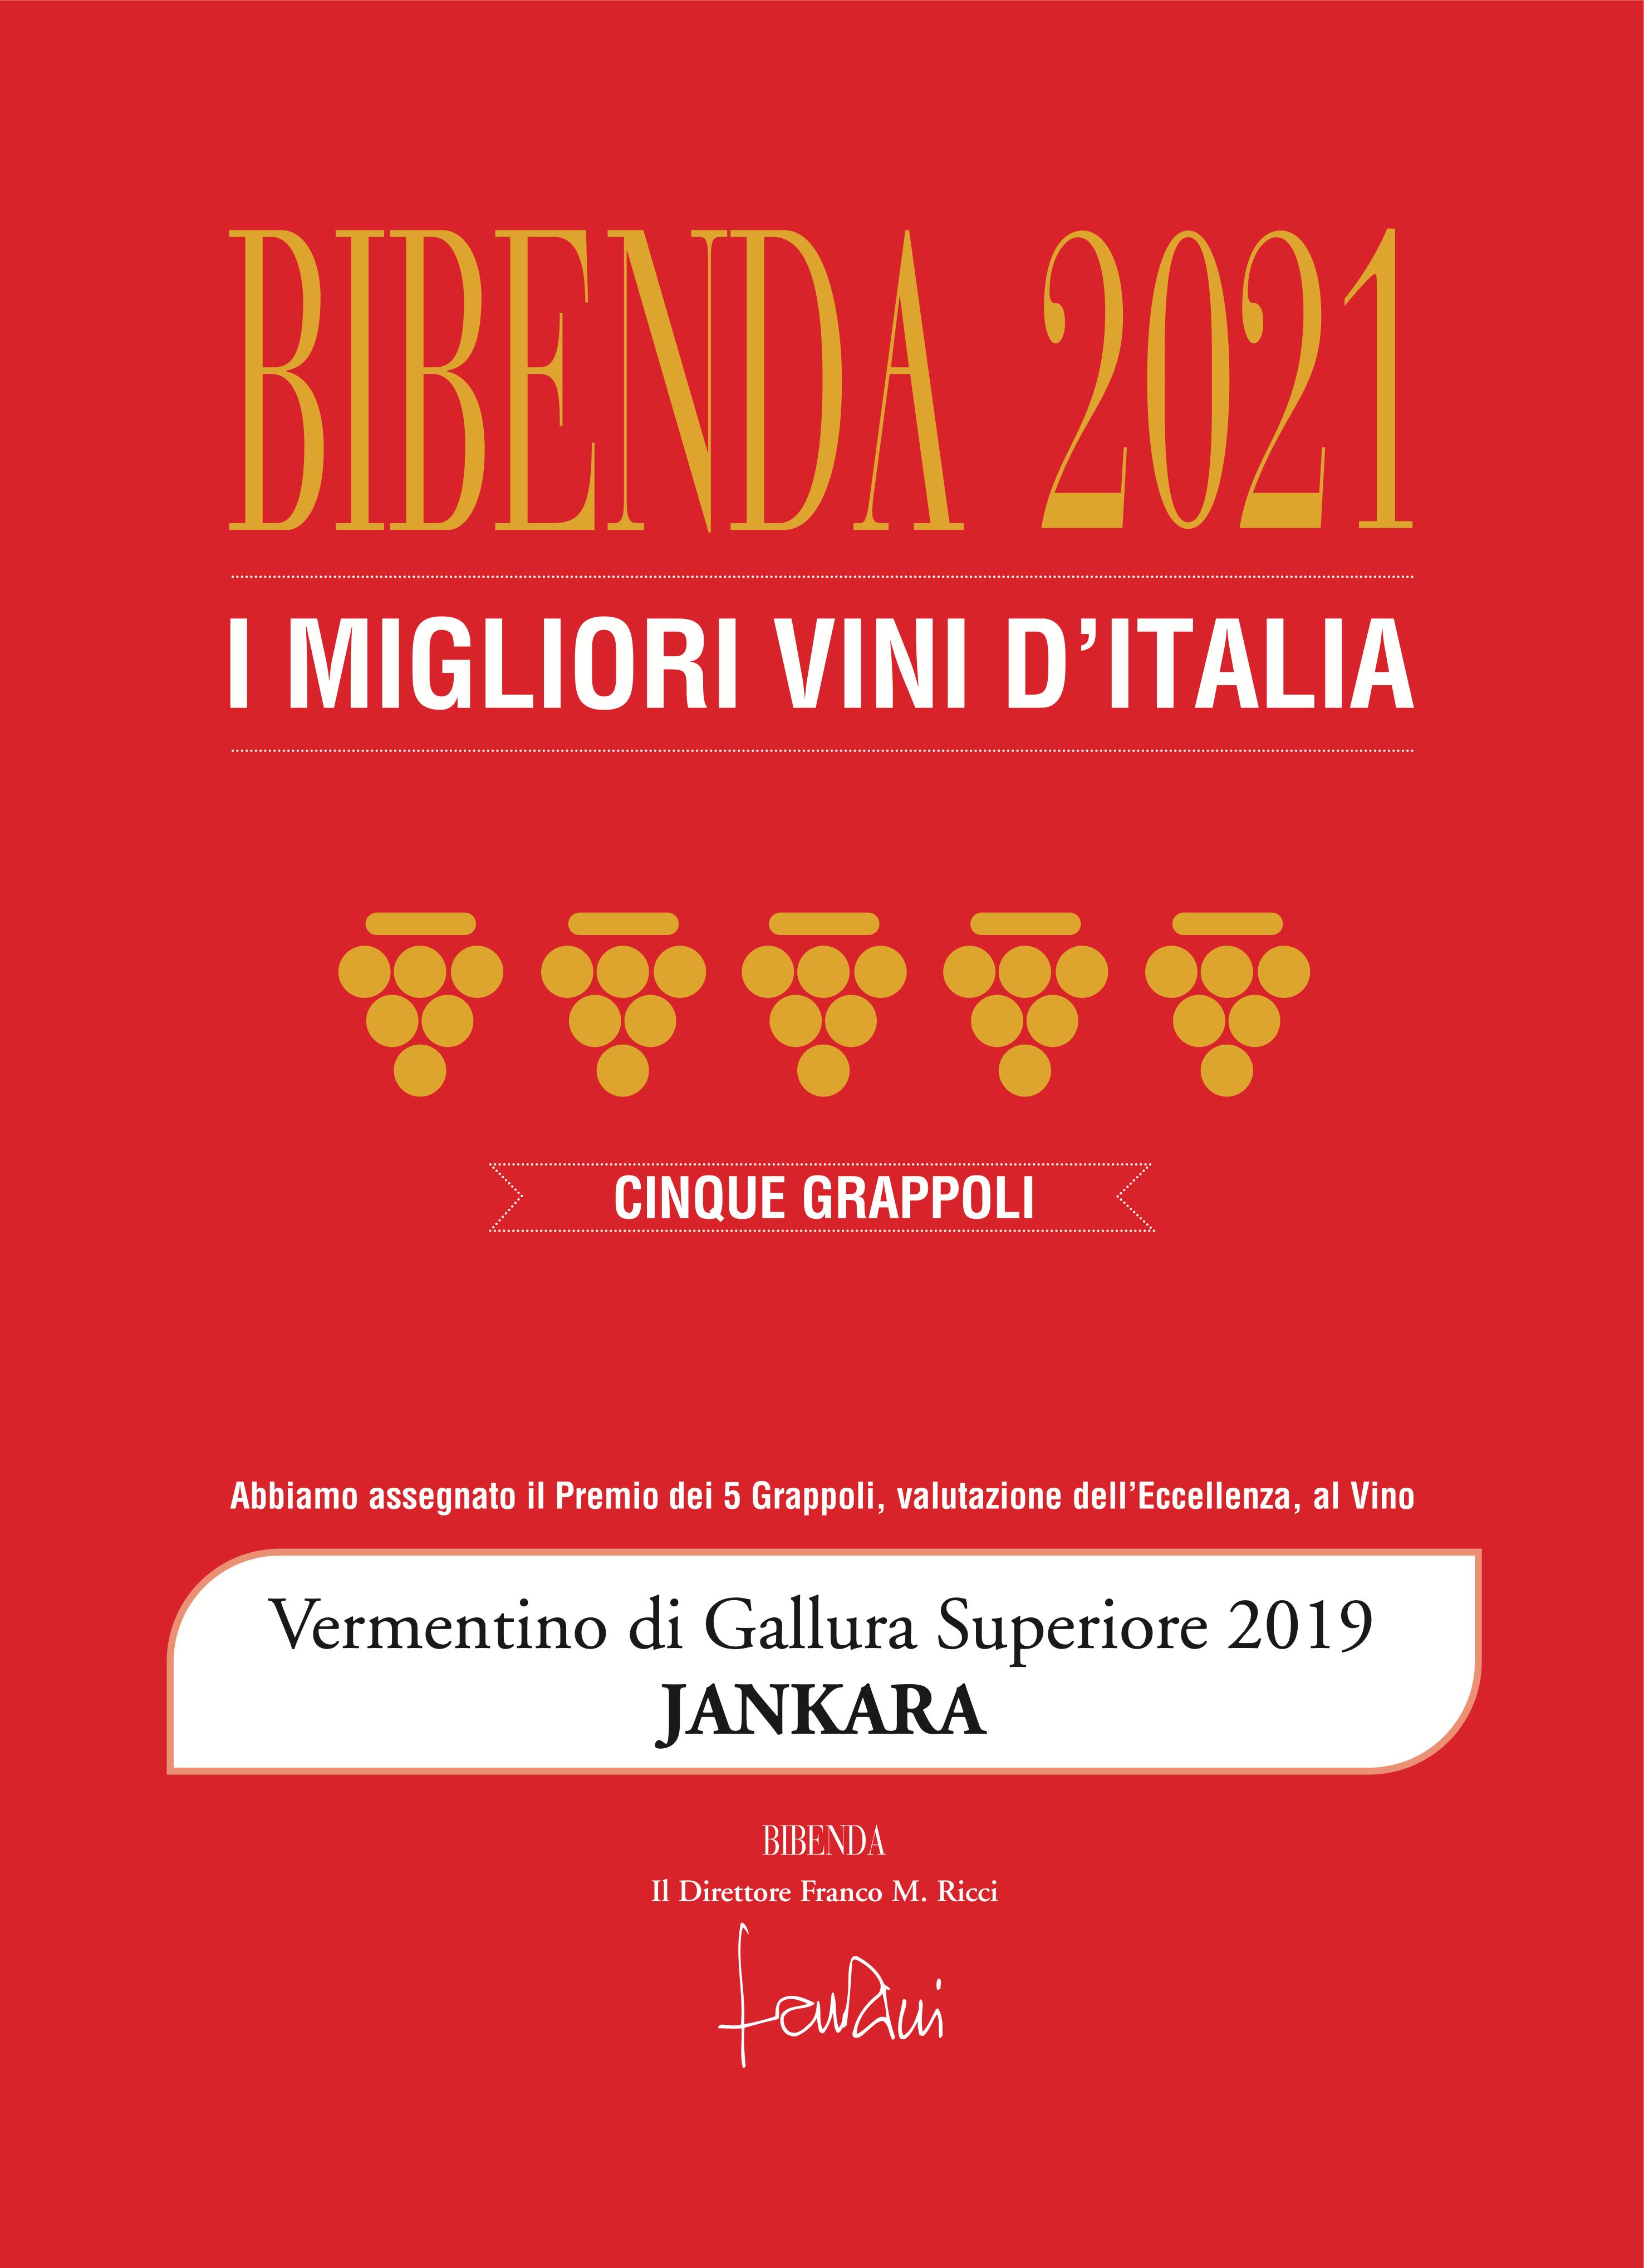 Bibenda 5 Grappoli 2021 award